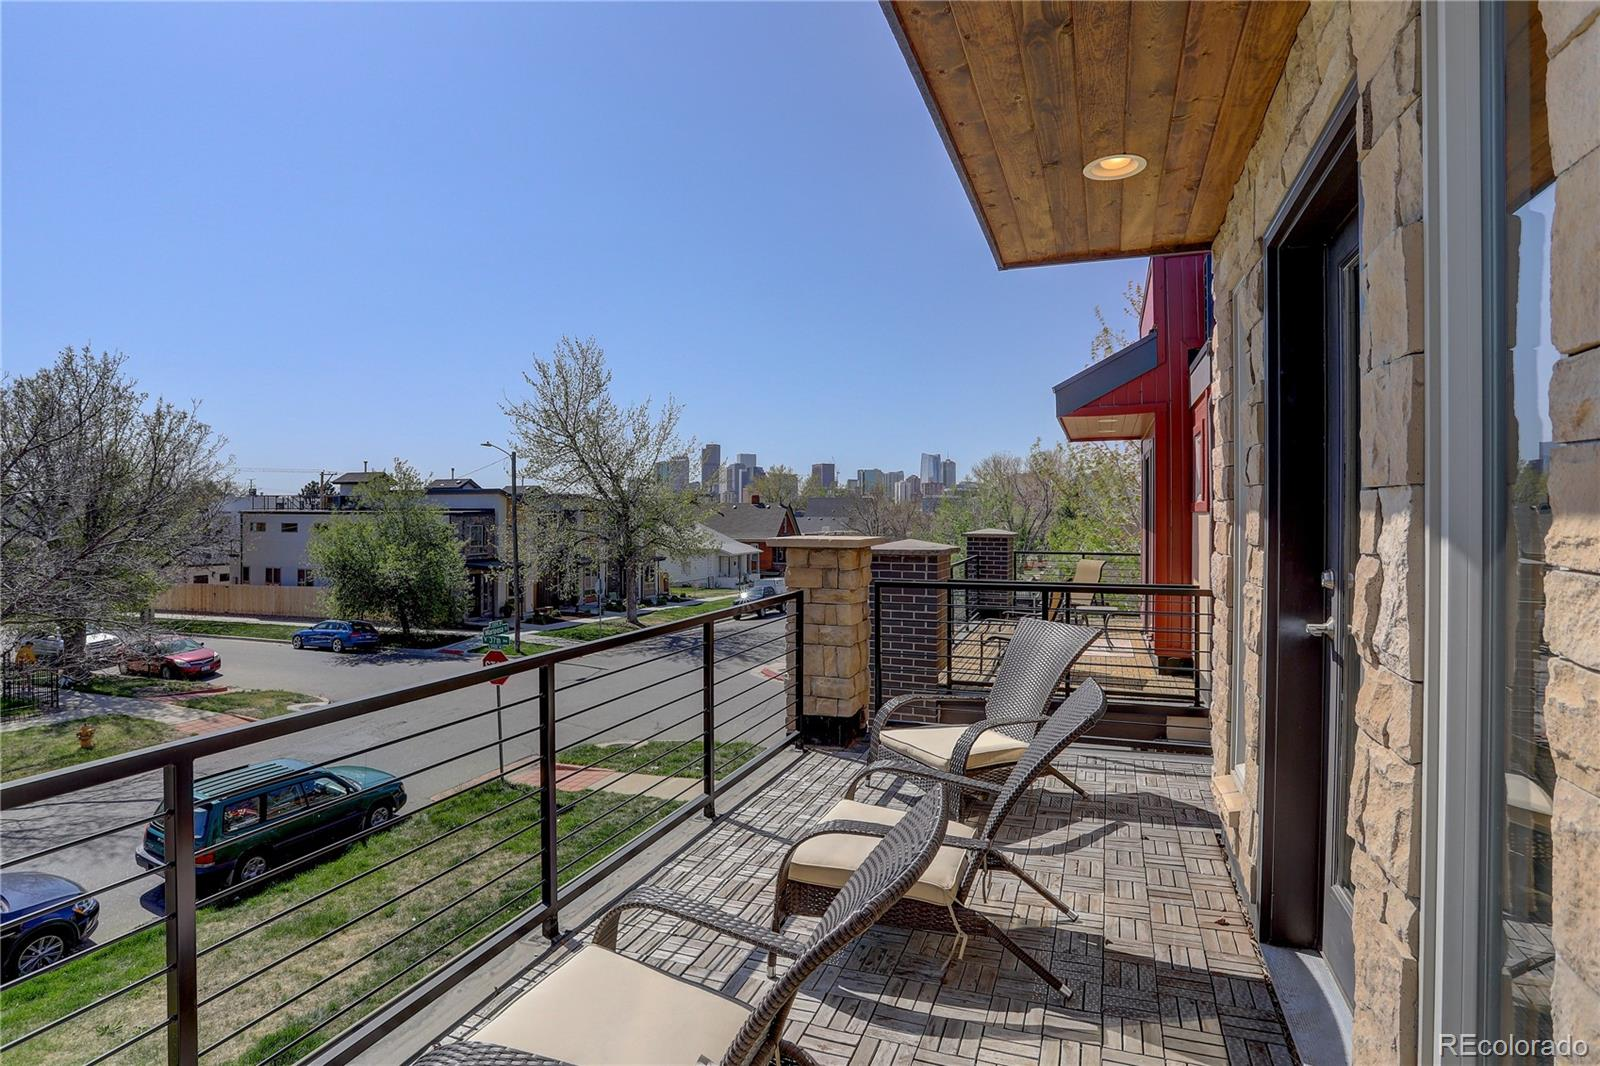 MLS# 5295441 - 16 - 3707 Mariposa Street, Denver, CO 80211